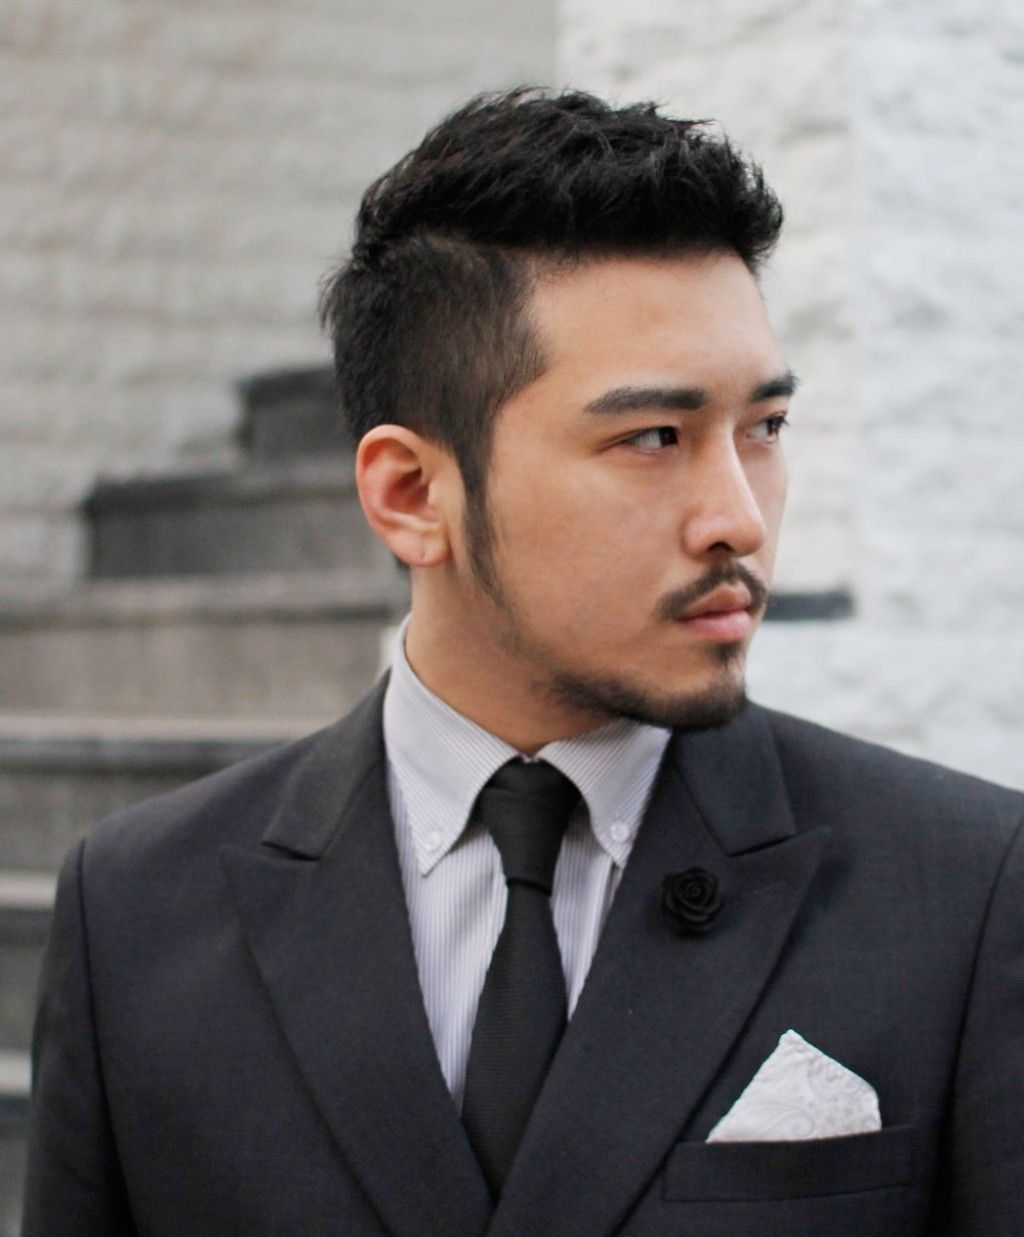 Short Hairstyles For Men 2015 Latest Trendy Asian Korean Hairstyles For Men 2015 Guy Hairstyles